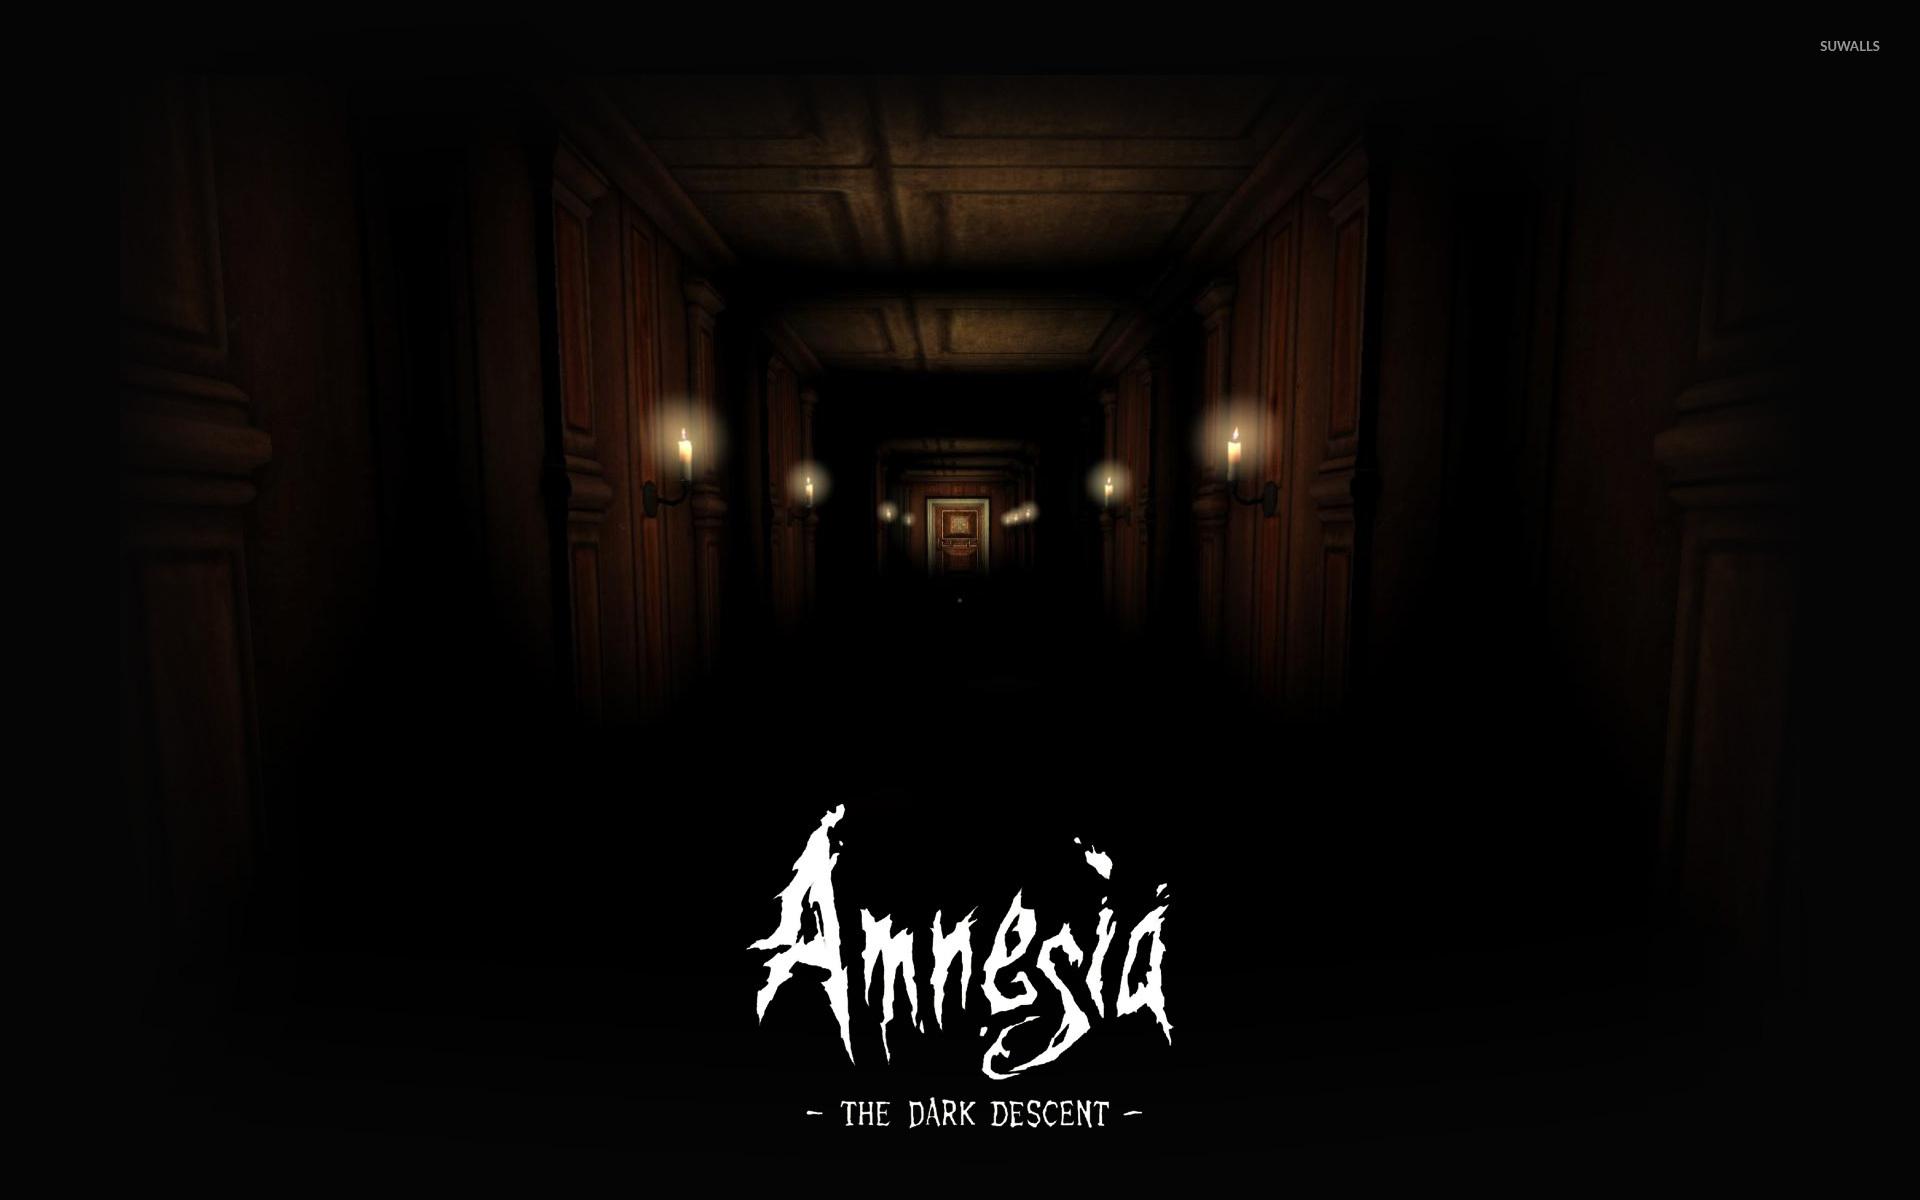 Amnesia The Dark Descent 4 Wallpaper Game Wallpapers 8893